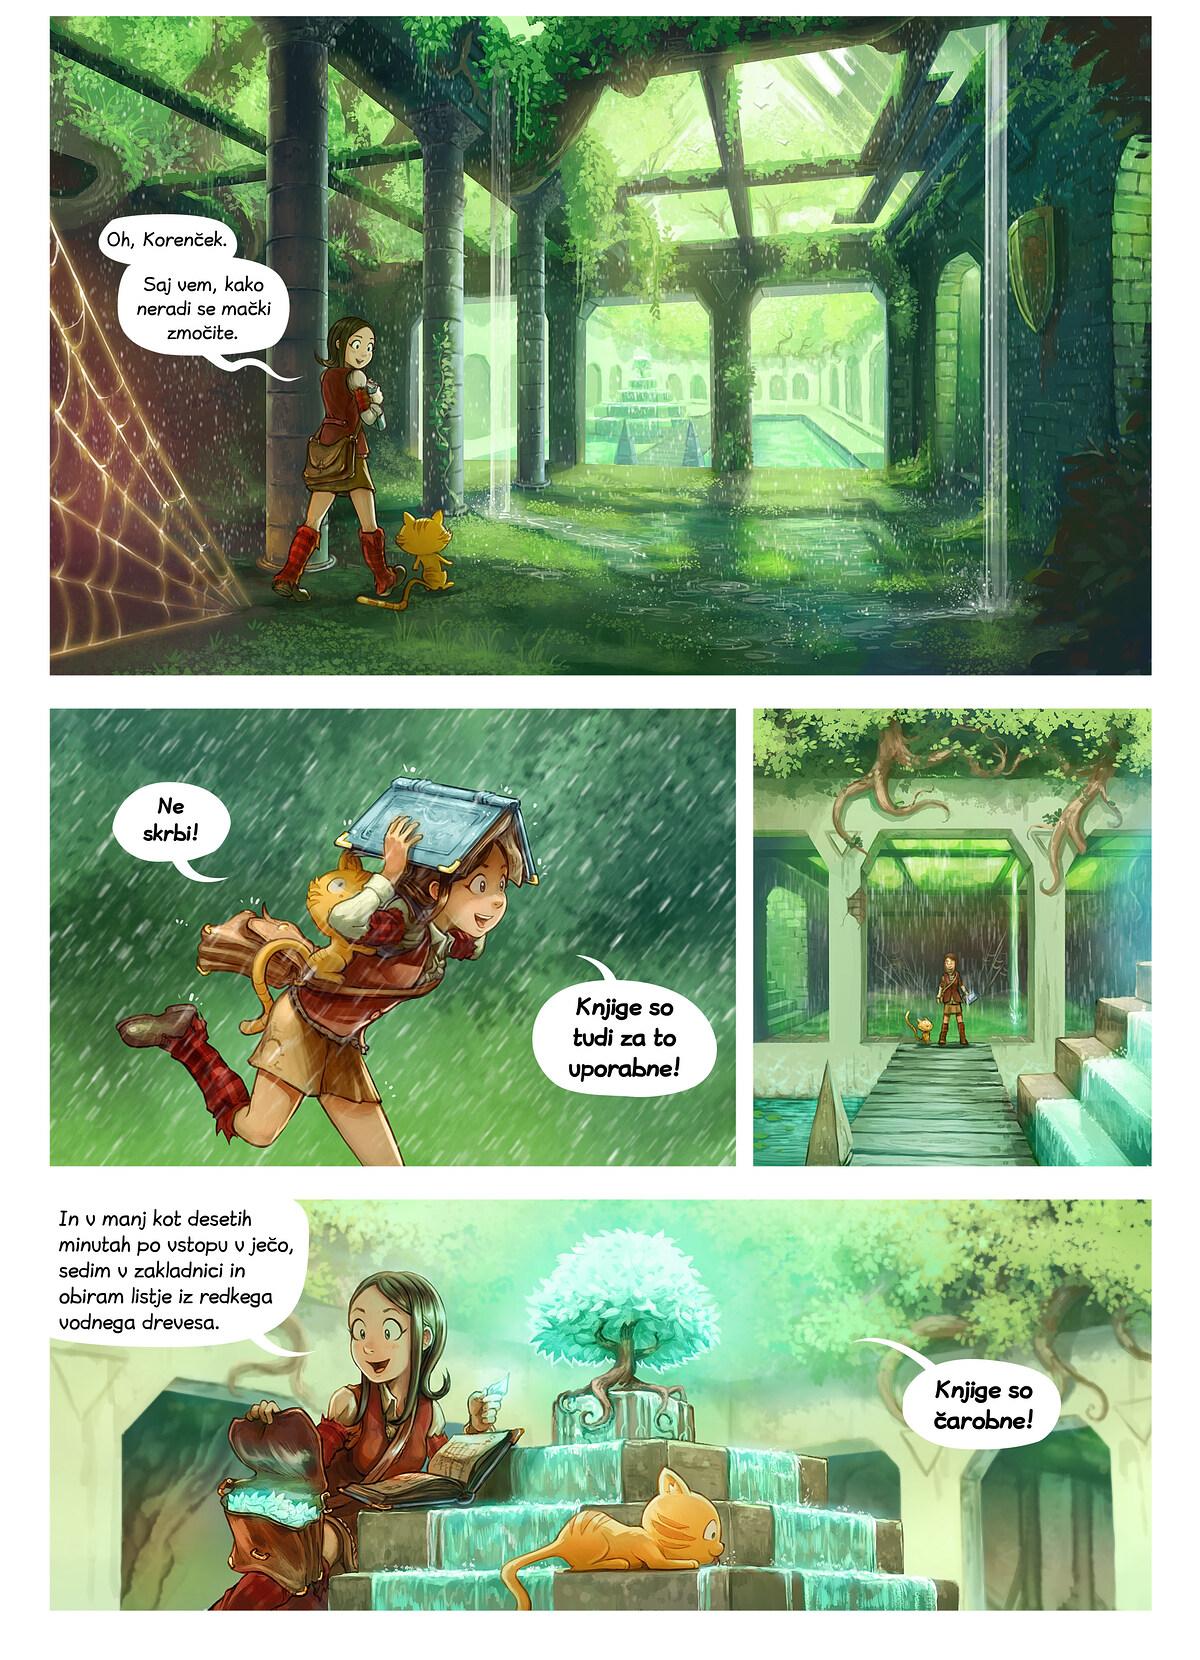 Epizoda 26: Knjige so super, Page 3